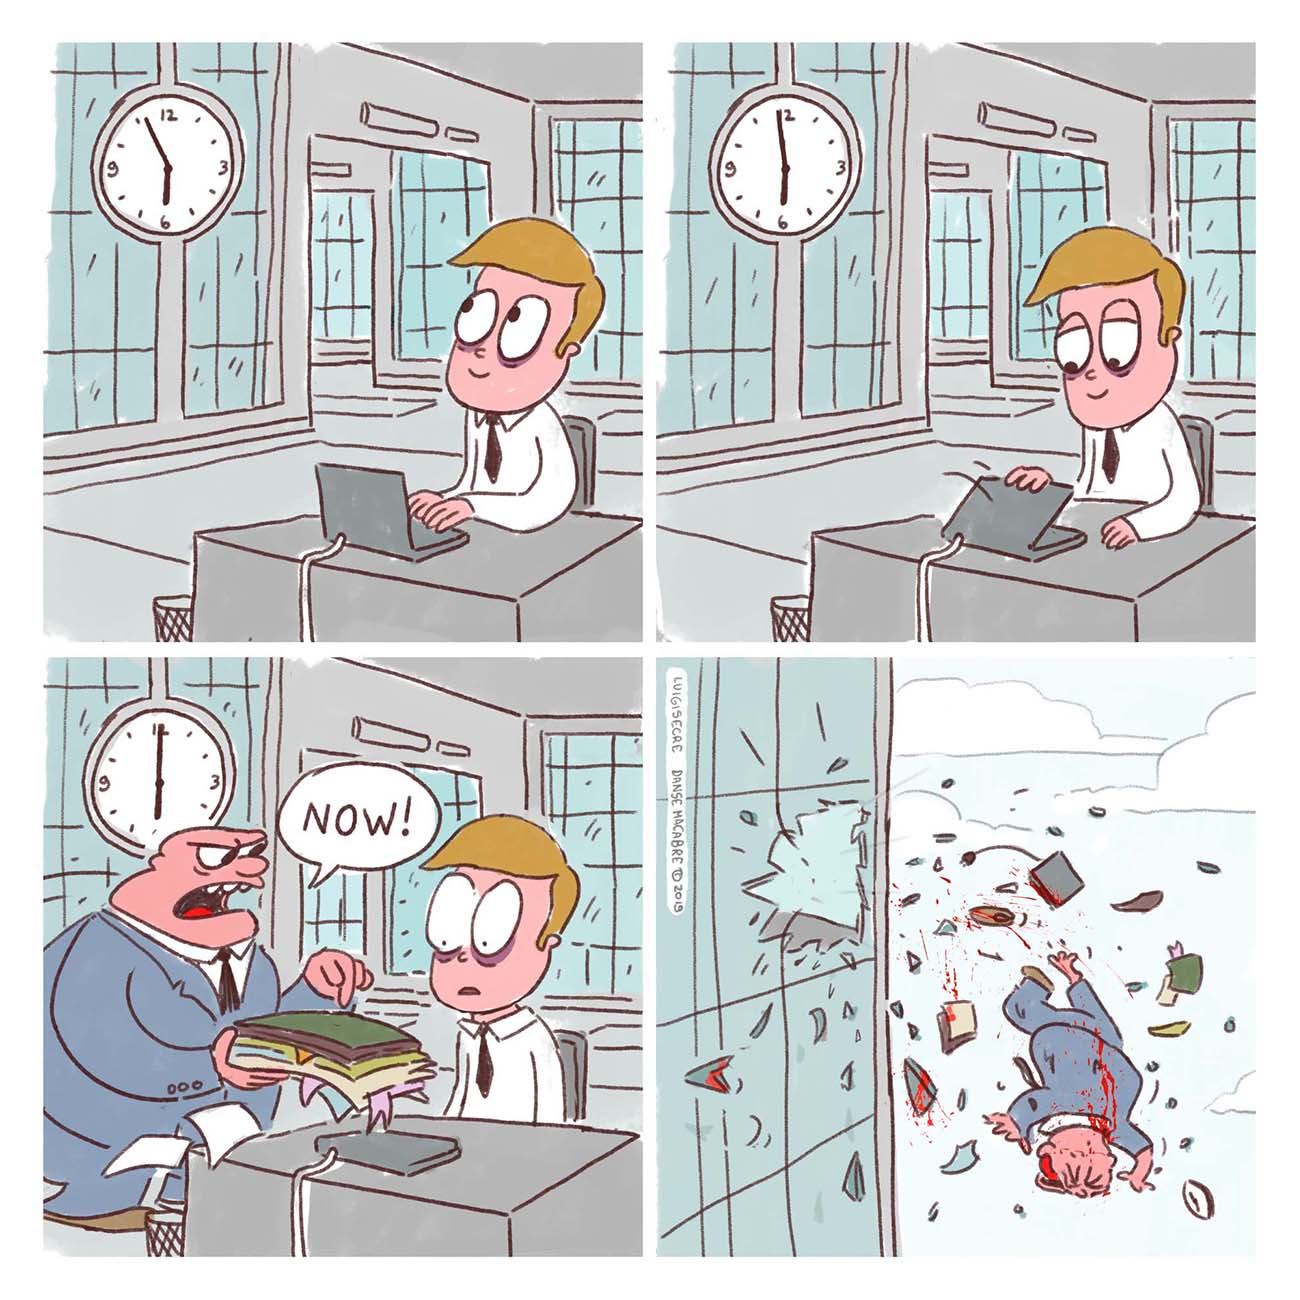 Contenuti_Low_Res_Luigi_Segre_Cartoons_2019_Danse_Macabre_24.jpg